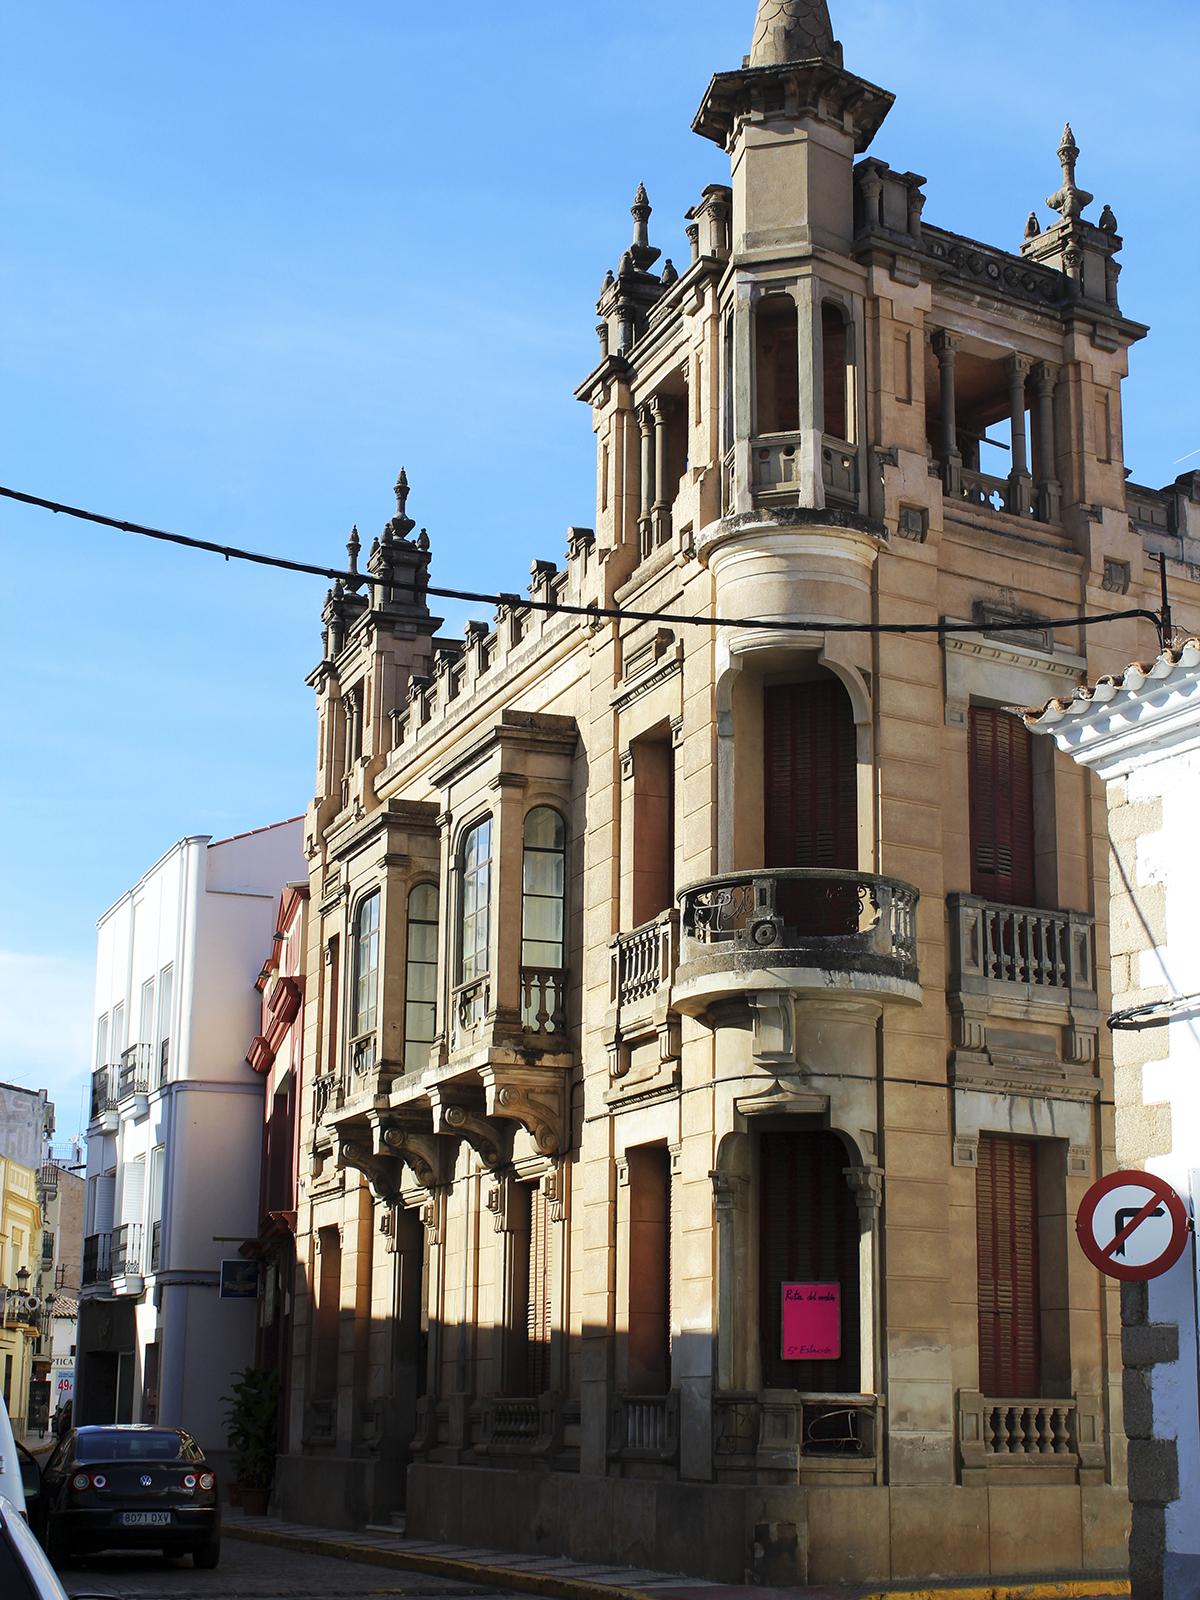 Palacete de 'Doña Catalina'